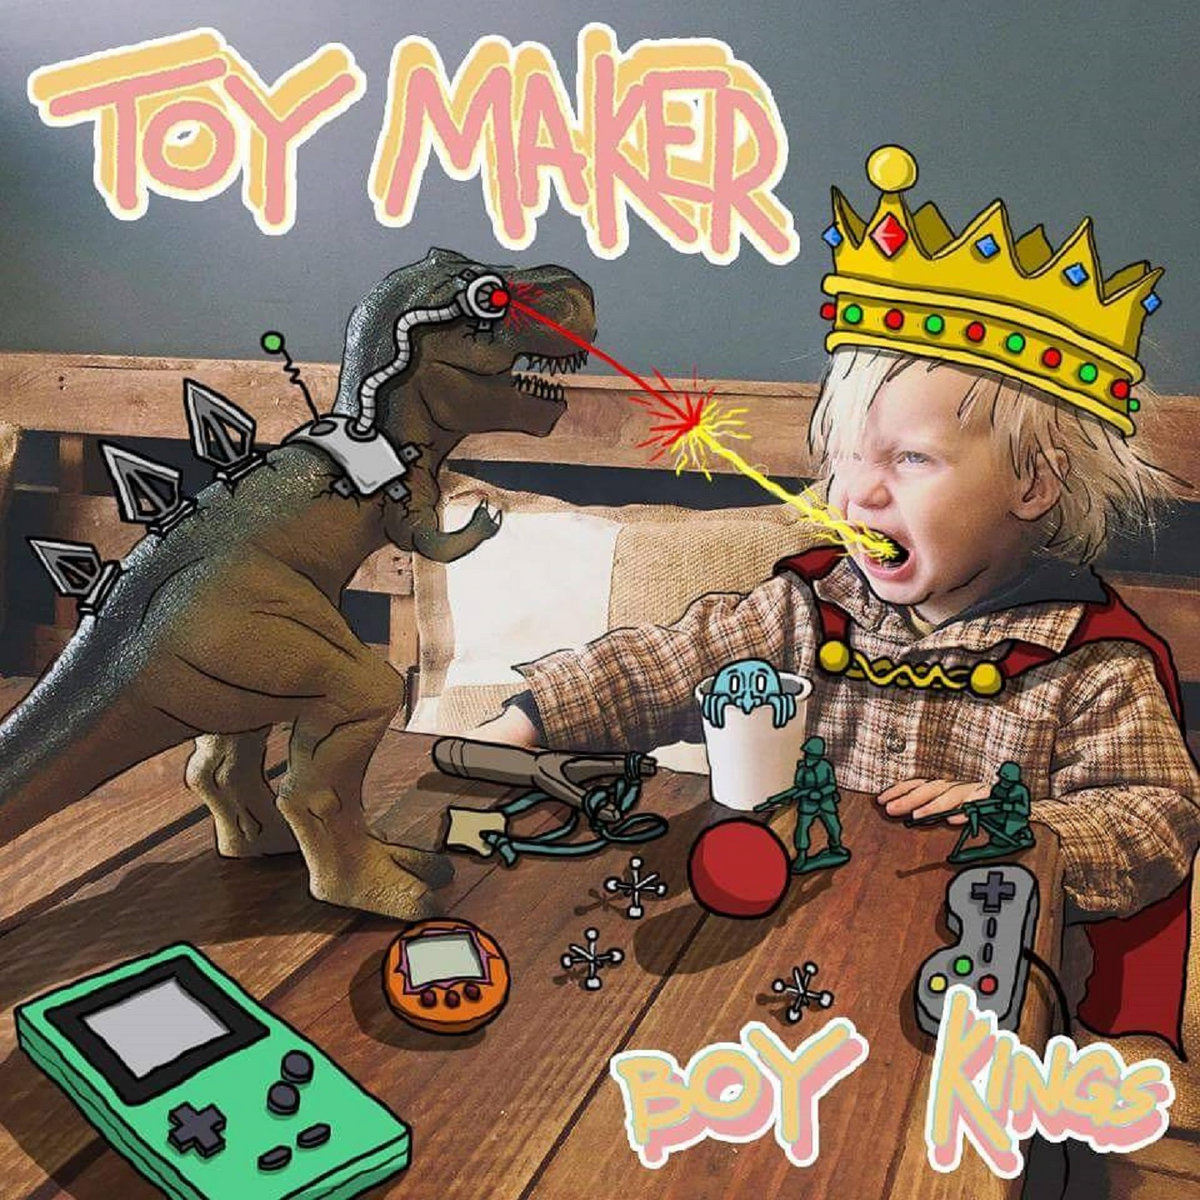 Broken Wrist | Toy Maker